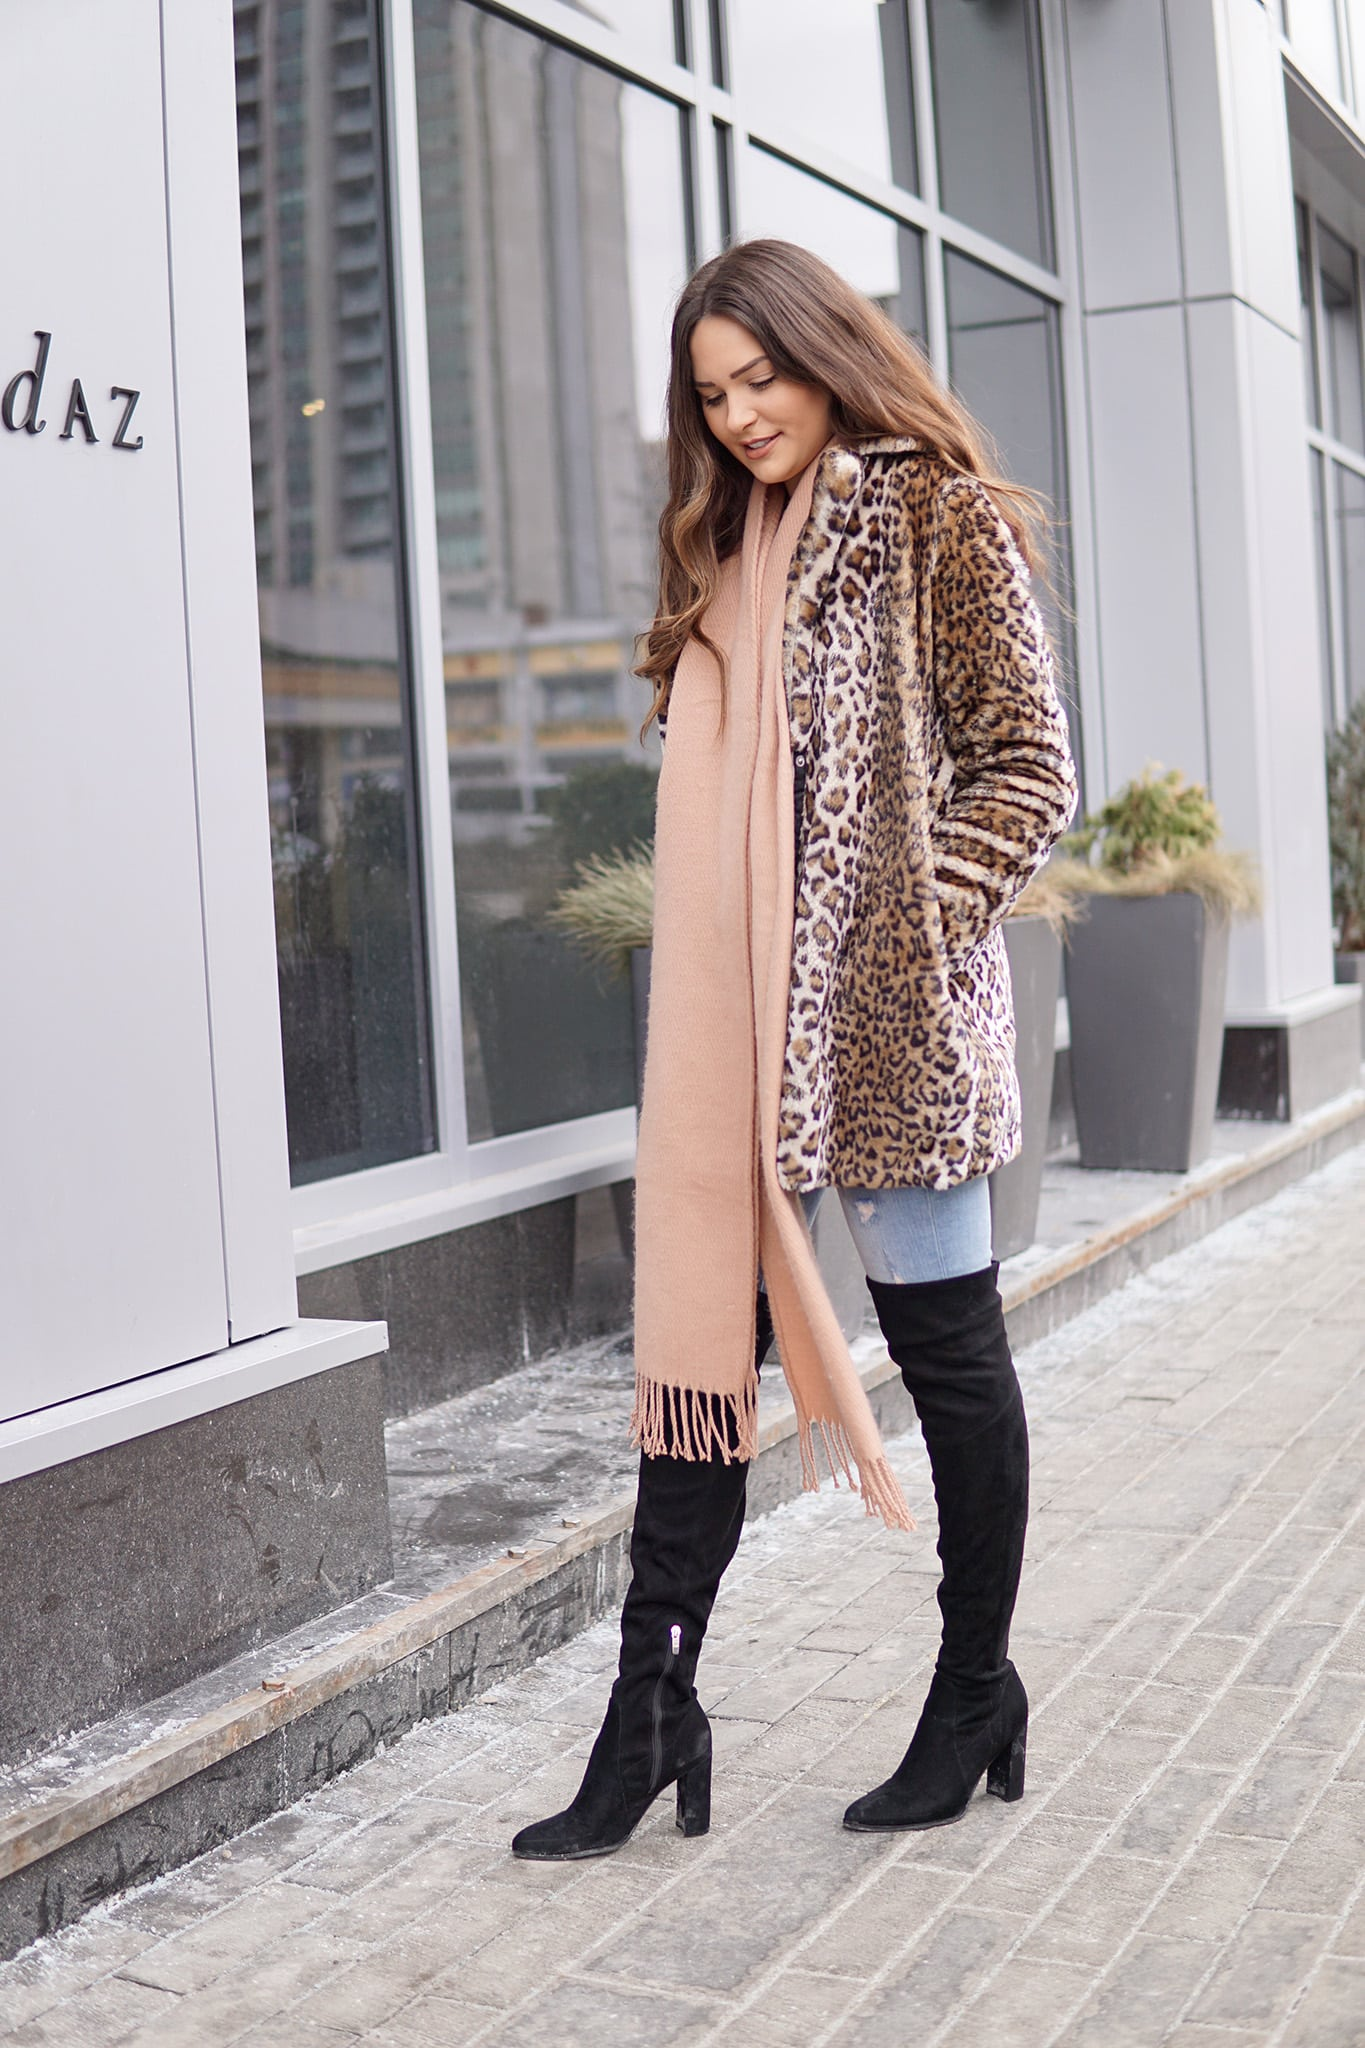 leopard print jacket outfit idea beauty blogger Mash Elle camel scarf